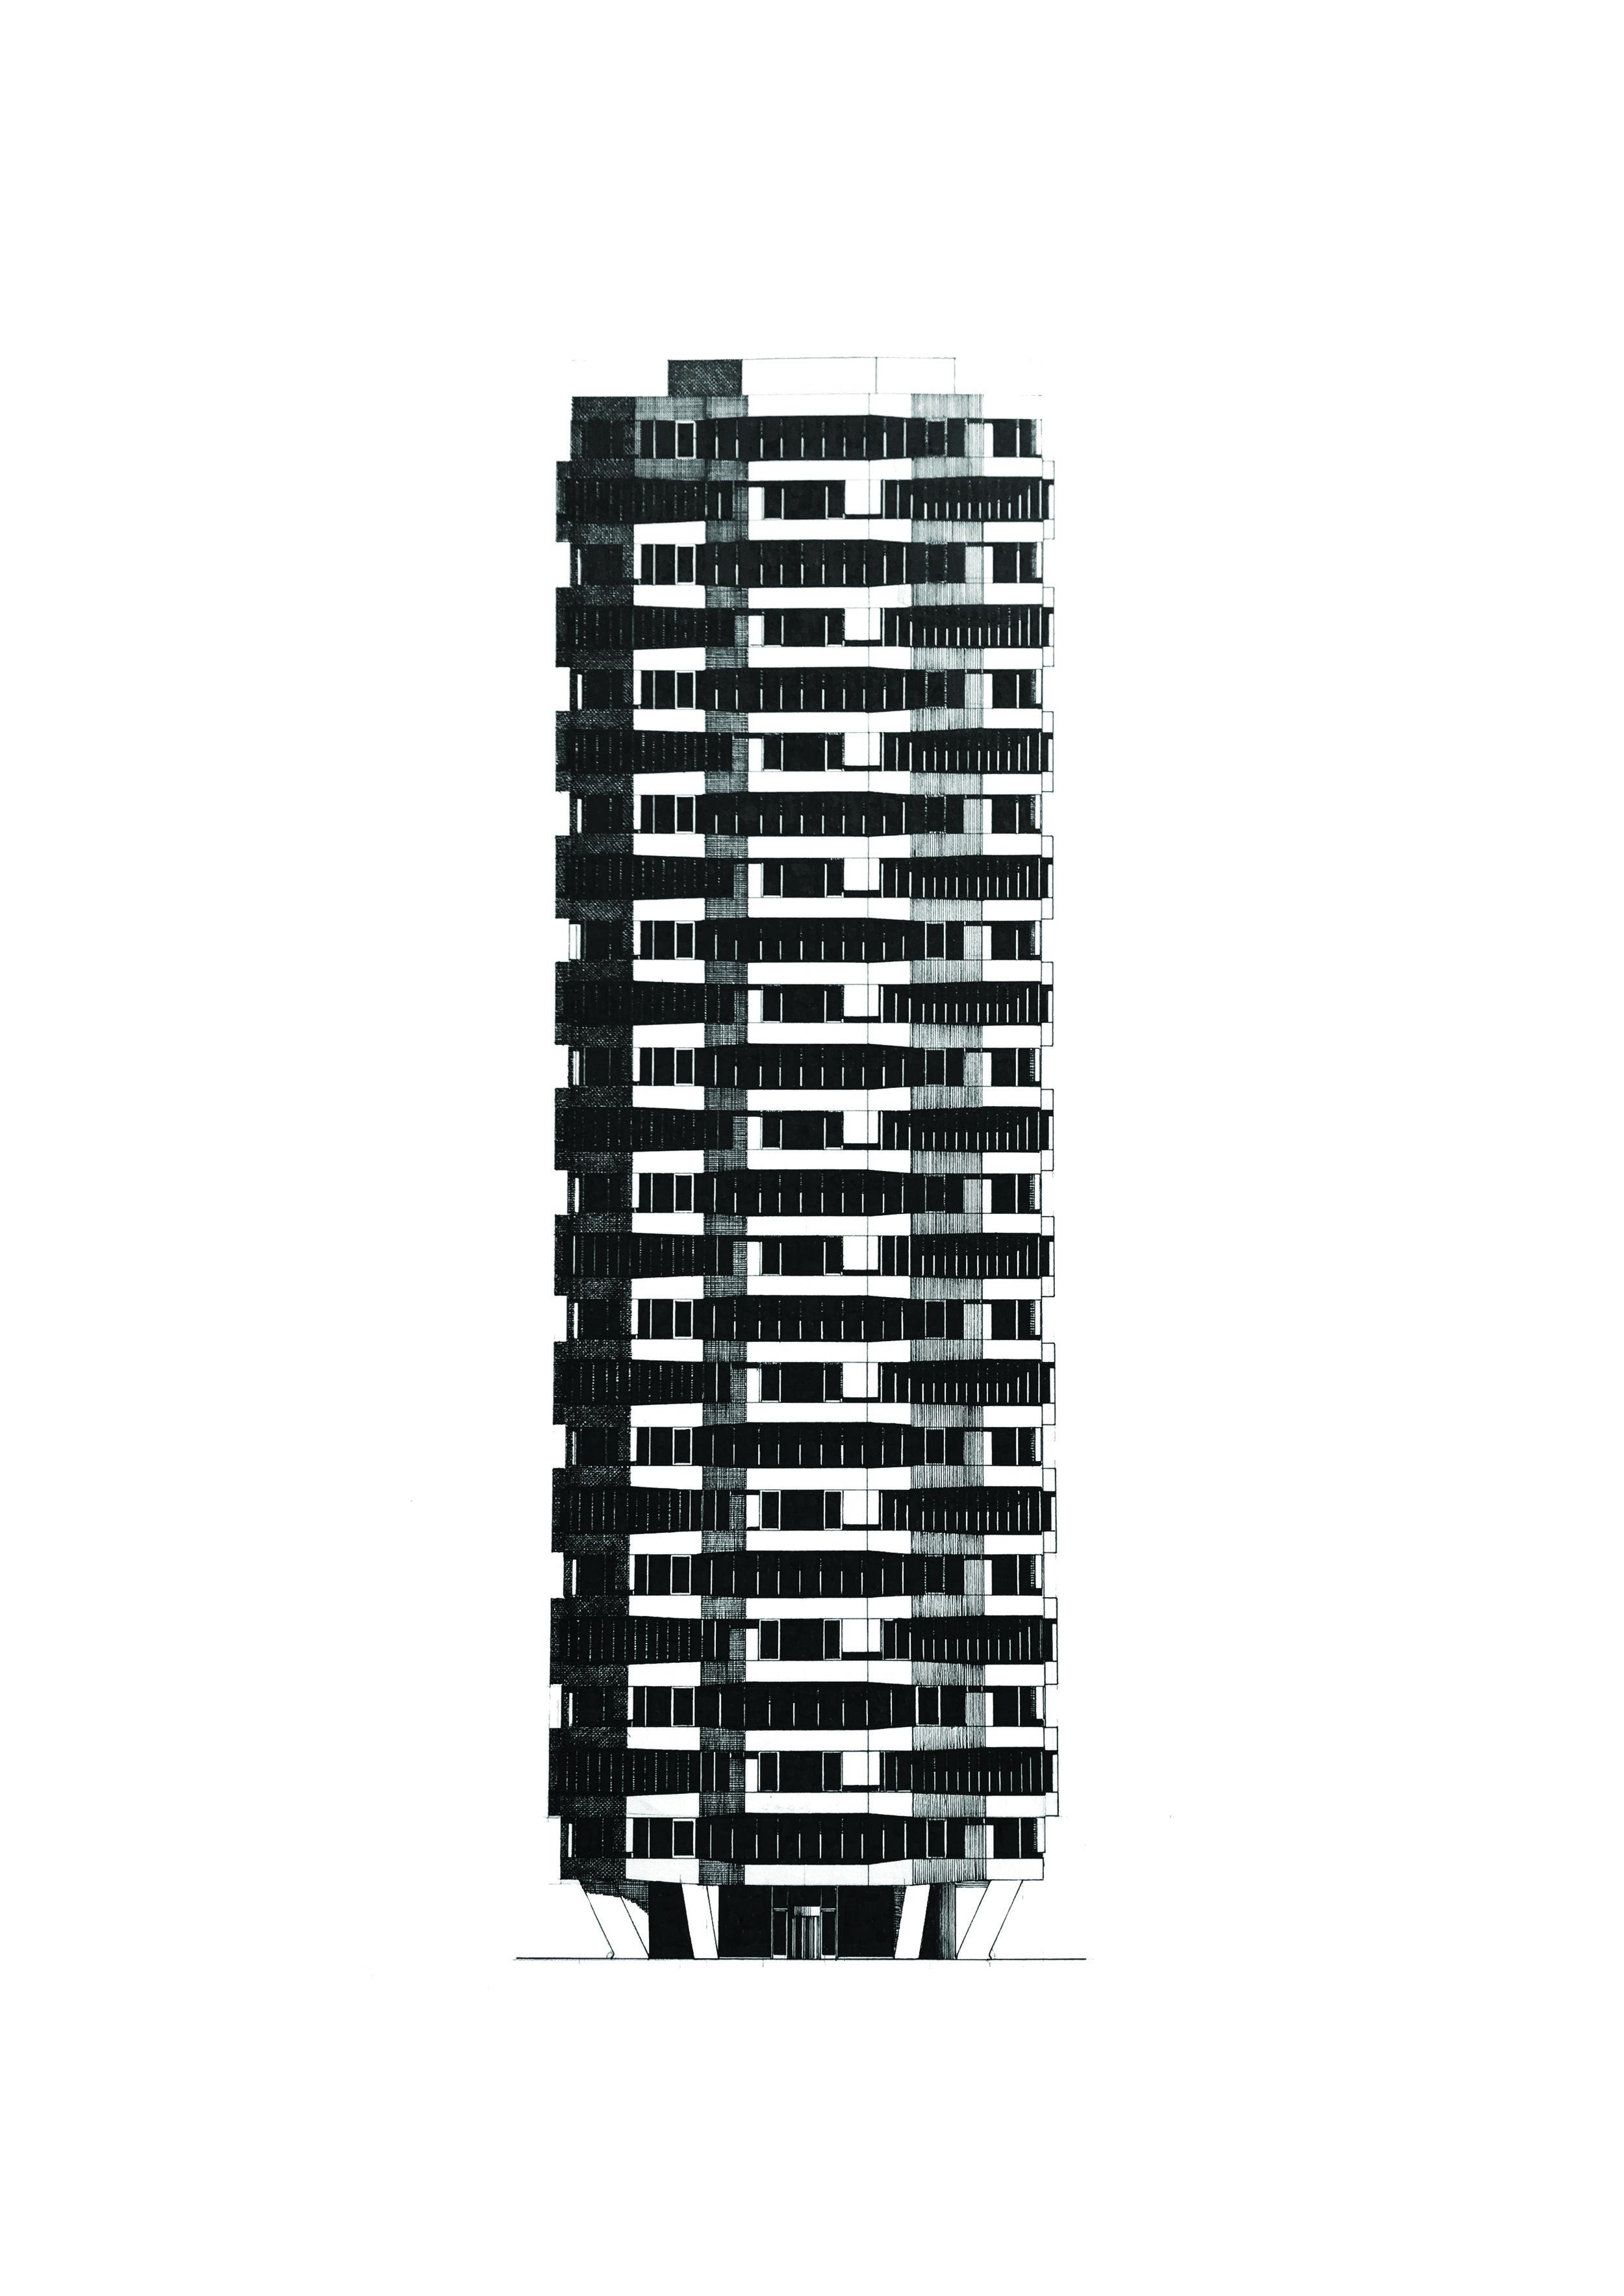 Former NLA Tower (One Croydon)